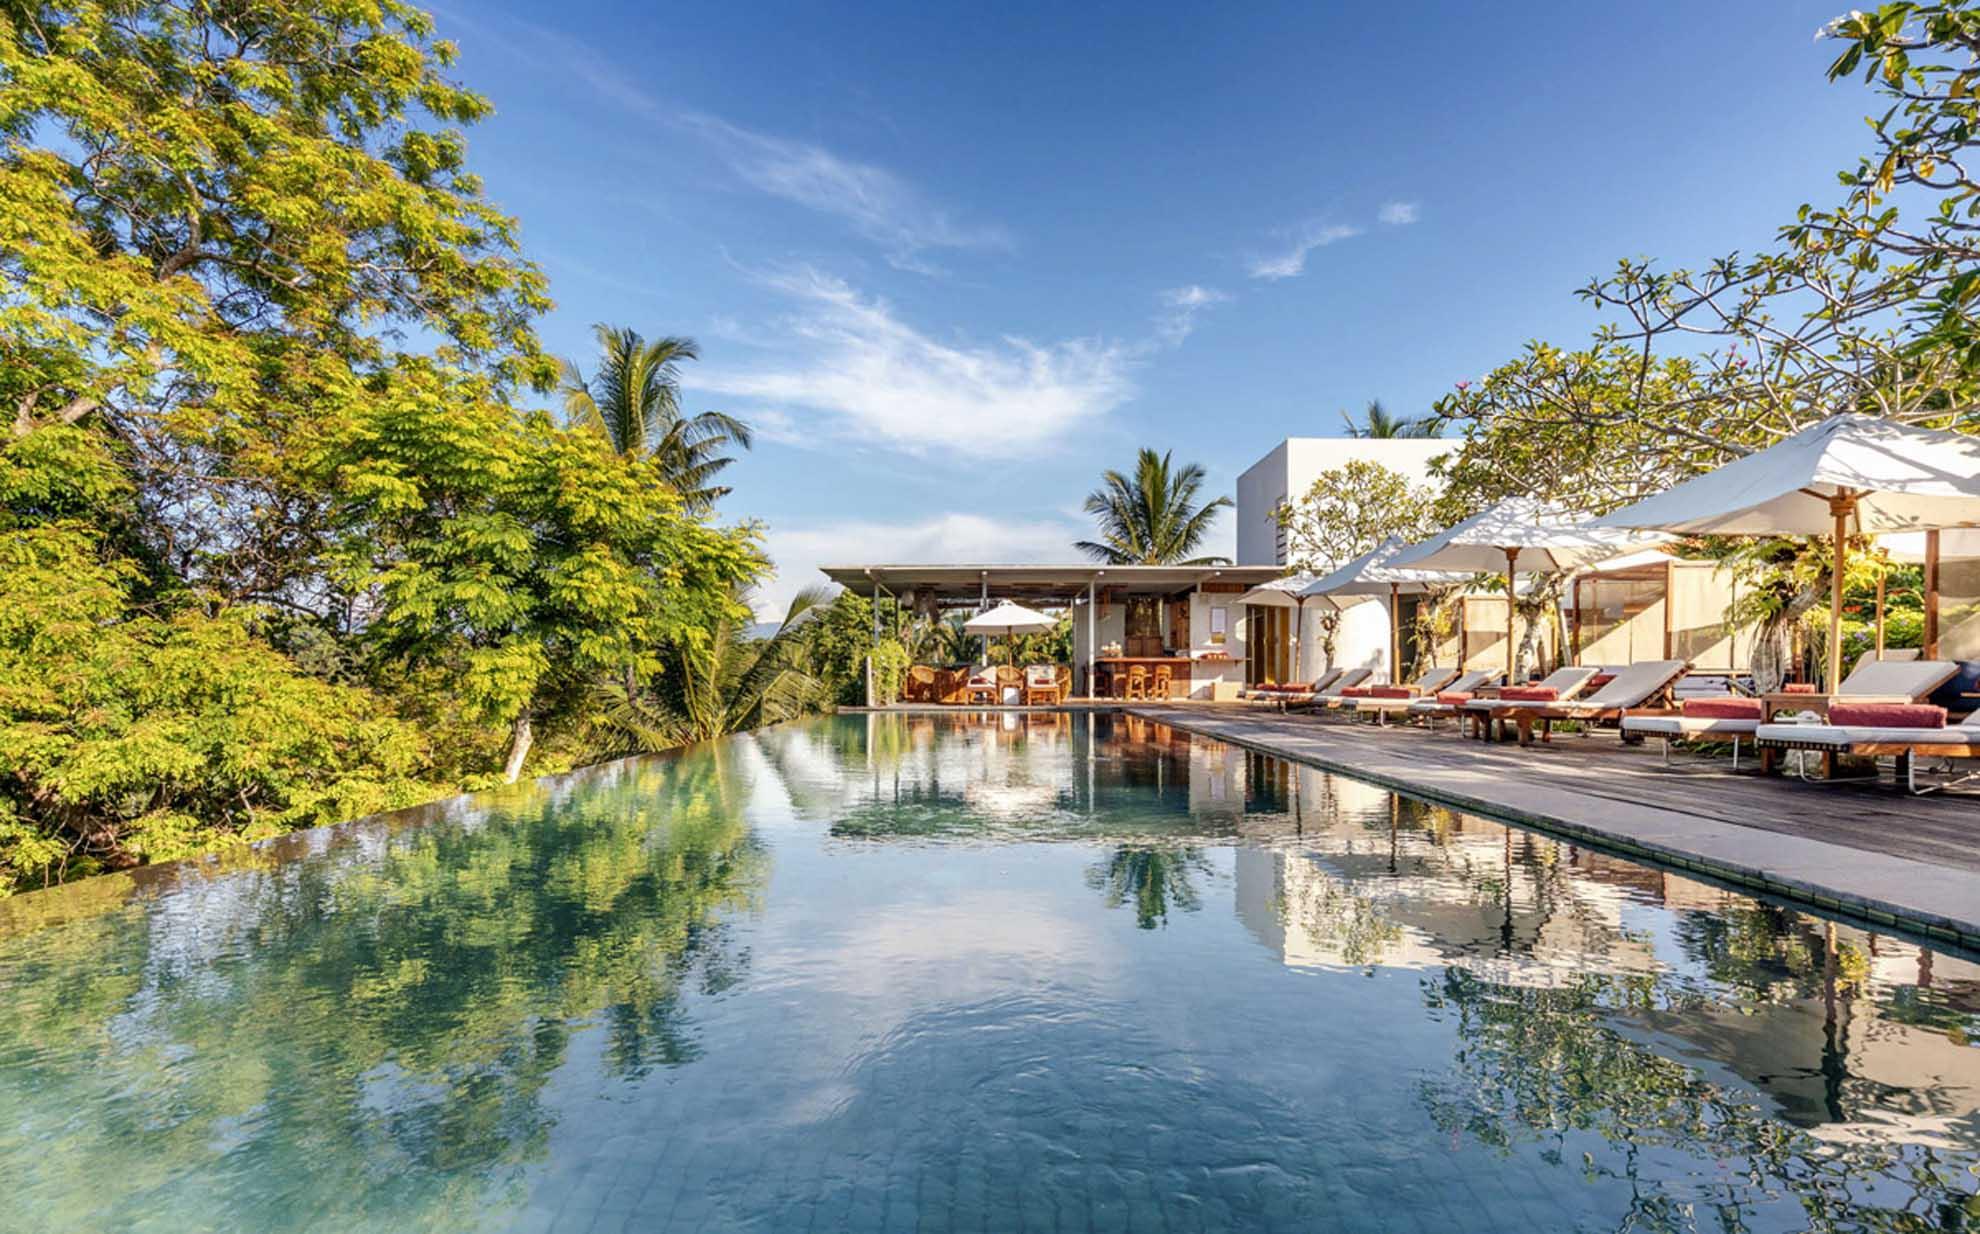 Ubud Bali Indonesia Asia Asian lesbian gay queer wedding honeymoon accommodation travel Dancing With Her directory magazine